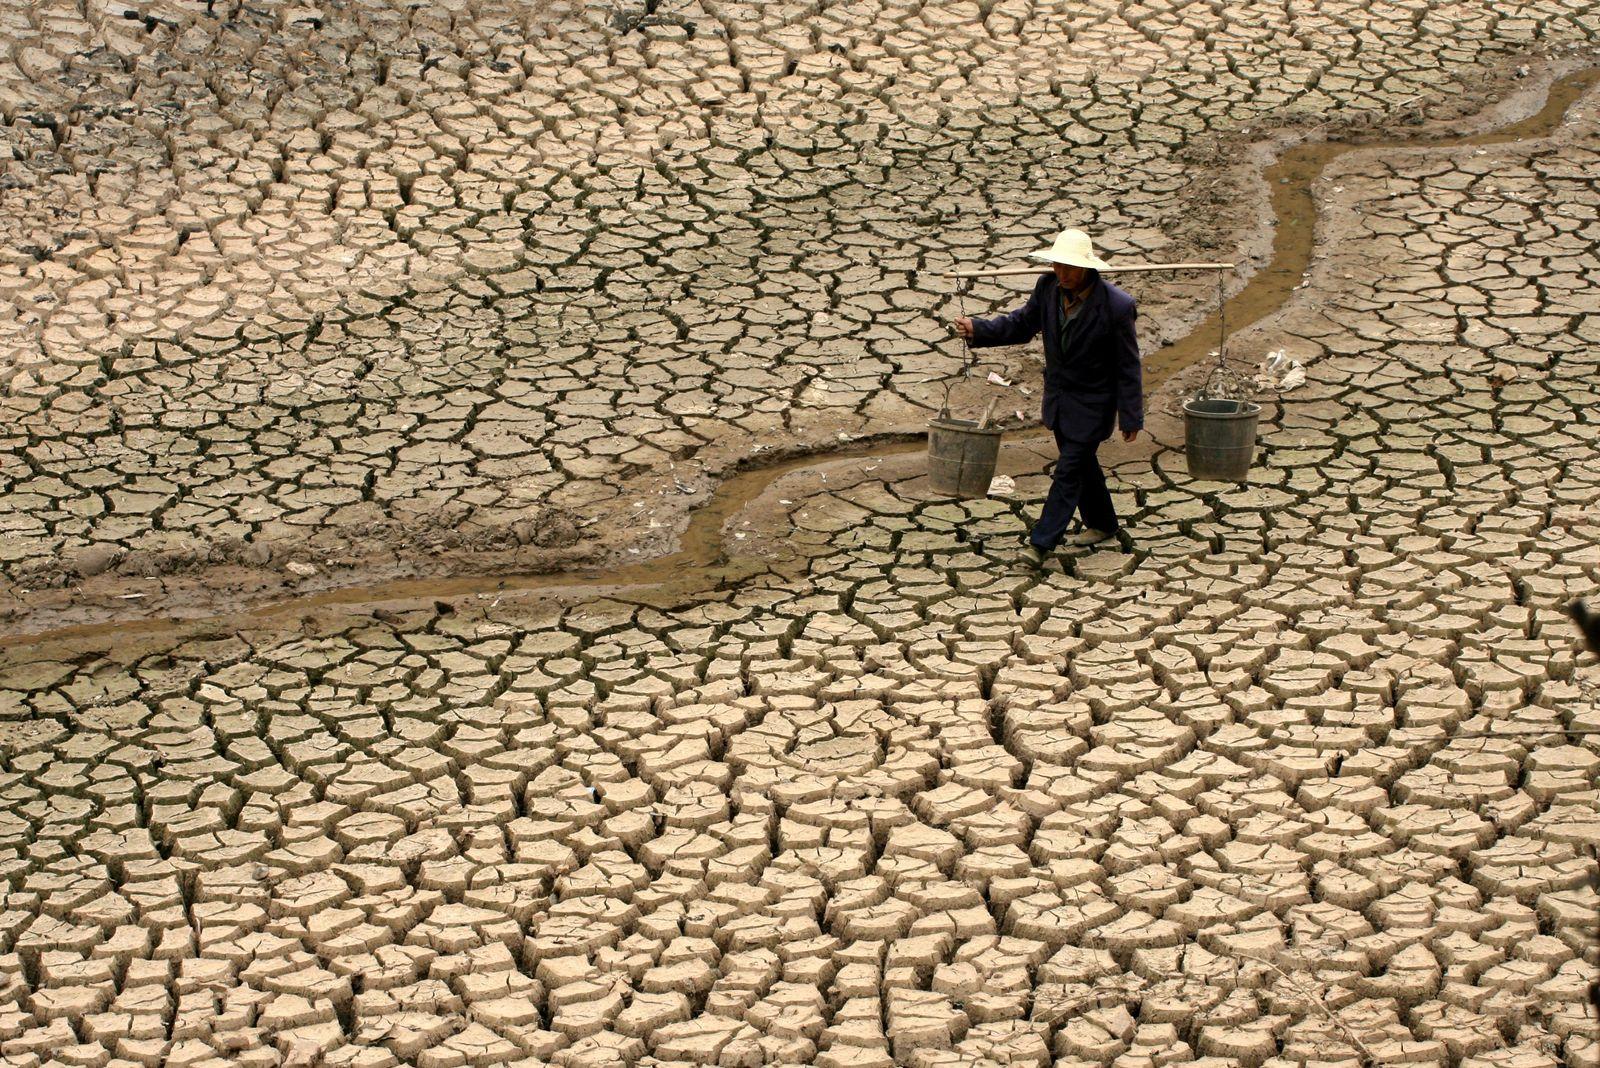 Dürre und Wassermangel in China / Trockenheit / Hunger